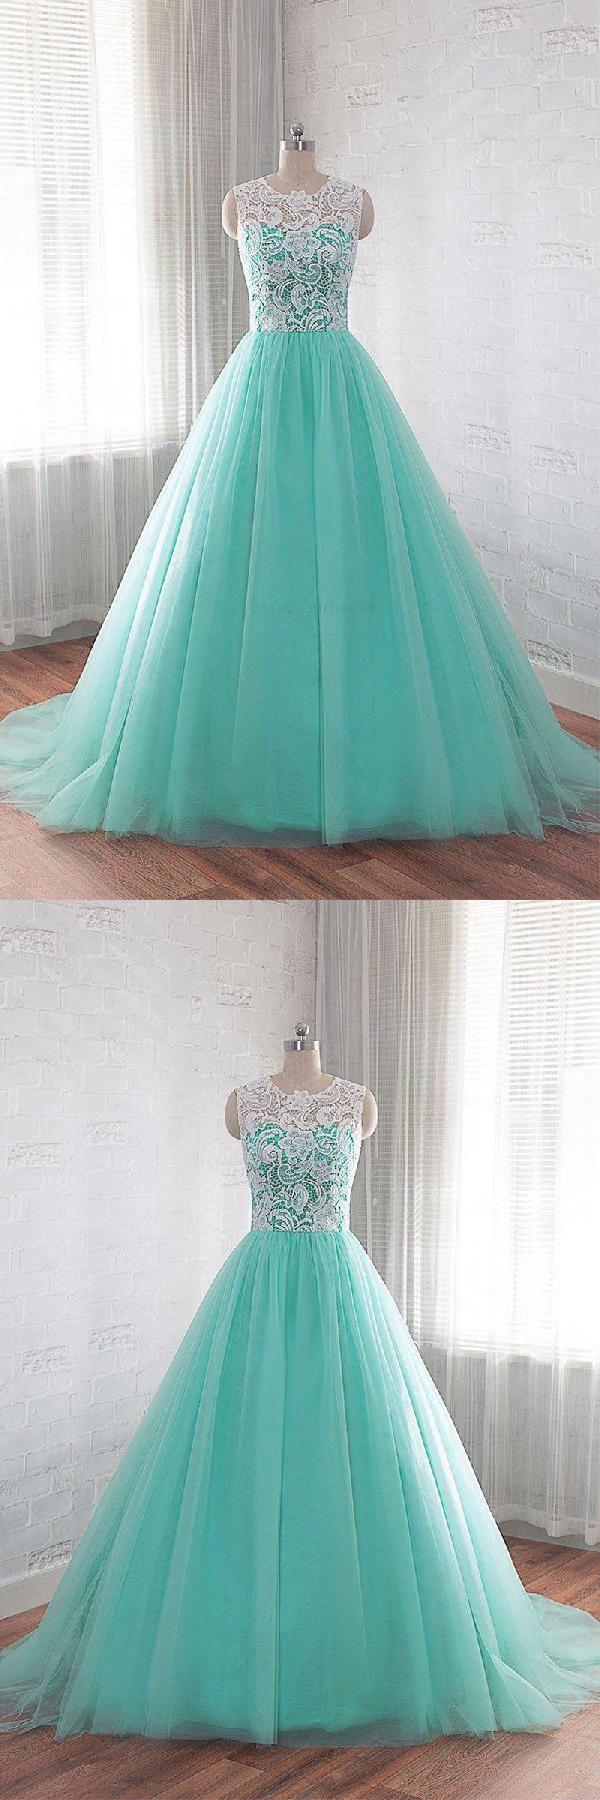 Green dress prom  Long Prom Dresses Prom Dresses Green Prom Dresses Lace